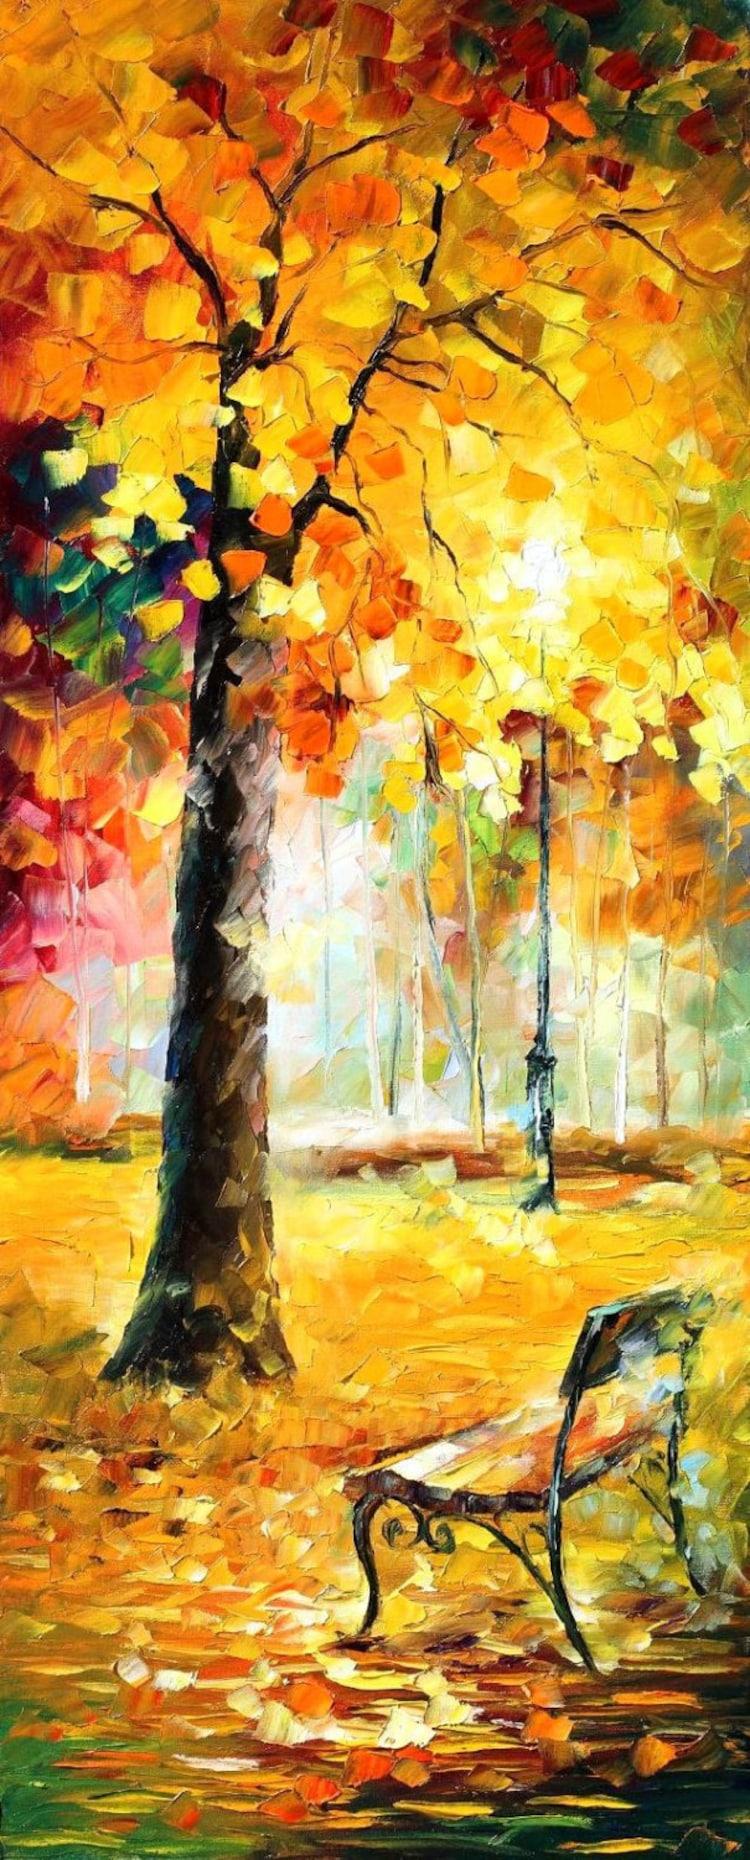 3 Piece Wall Art Wind Of Dreams Set Of 3 By Afremovartstudio